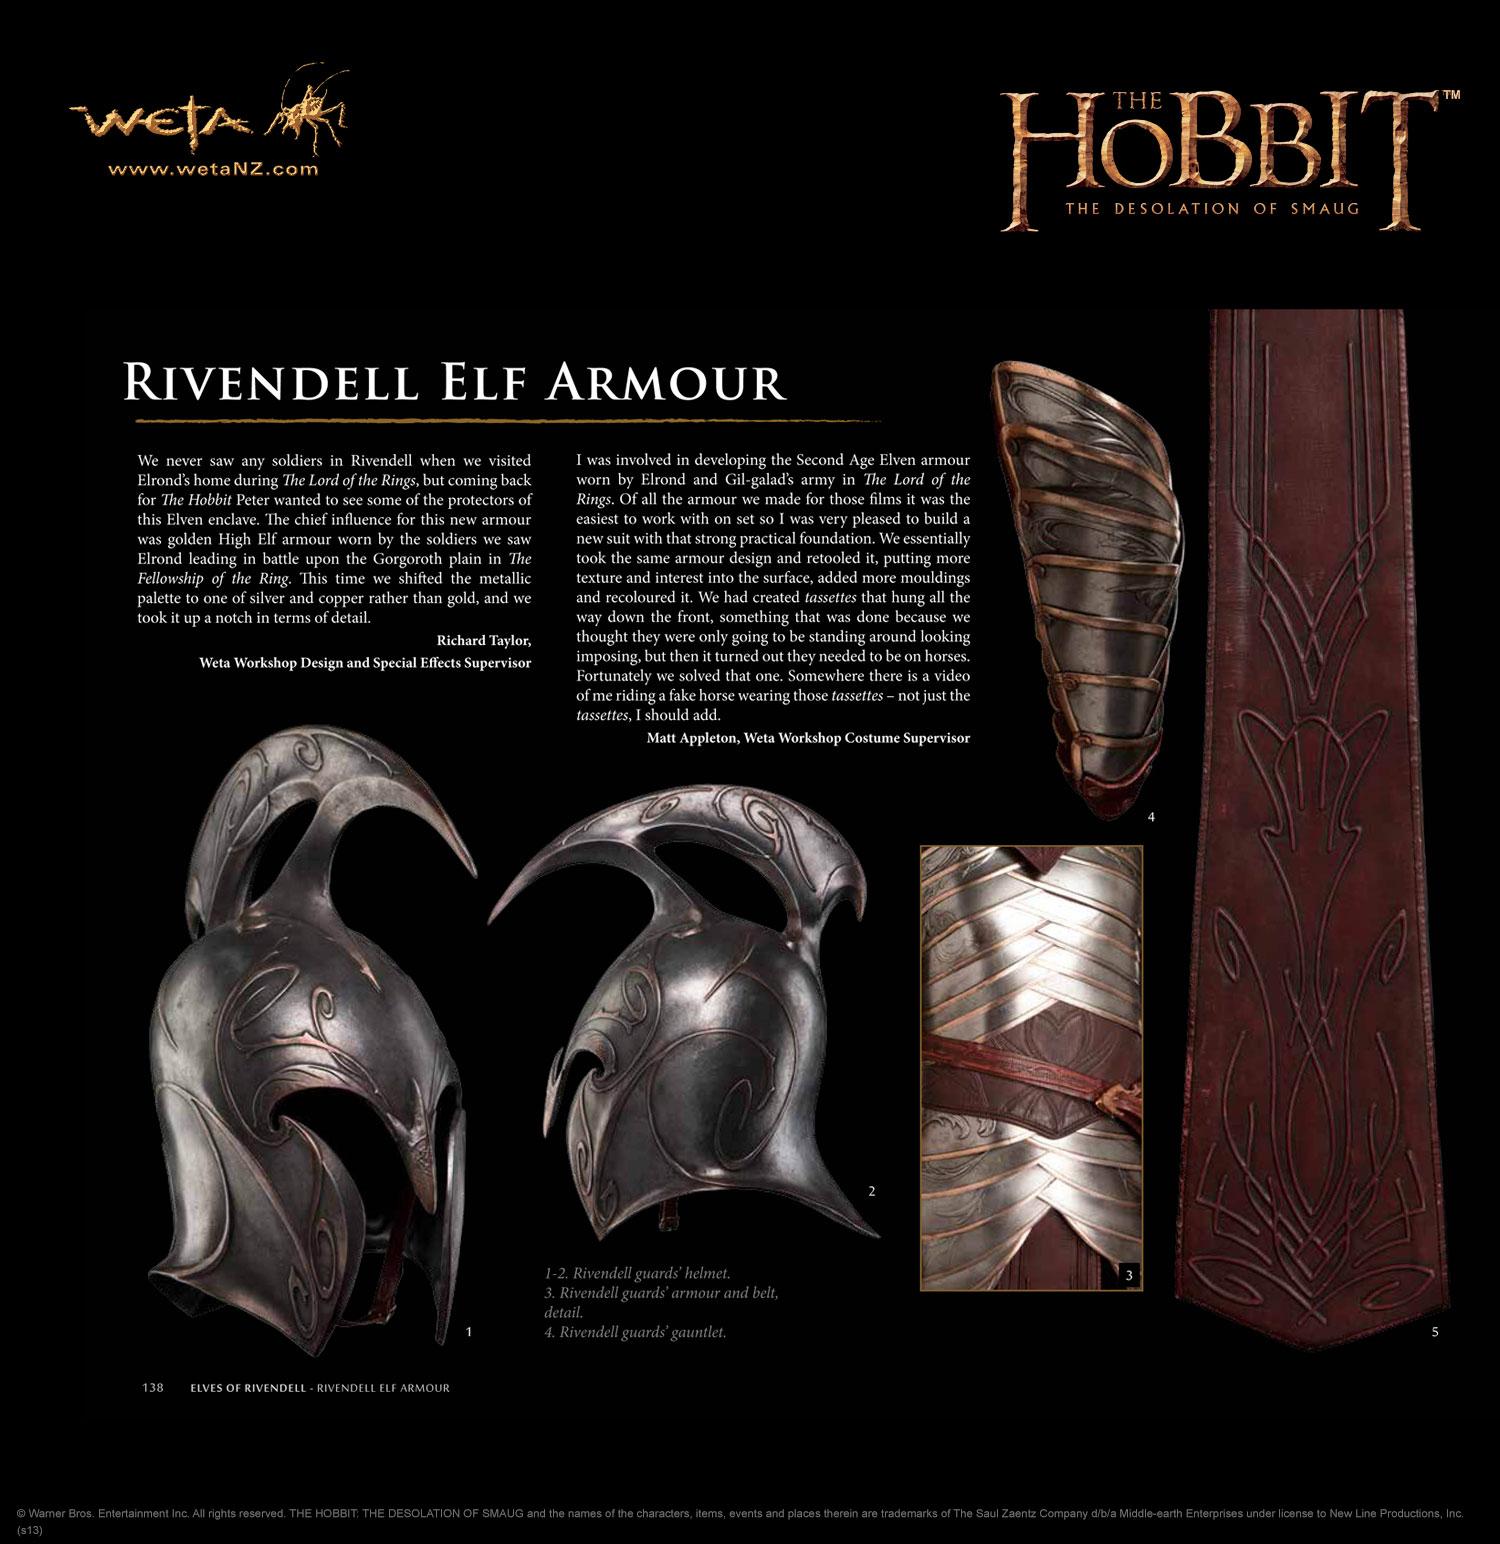 hobbit-chroniclesDoSCloaksDaggersd2 (1)